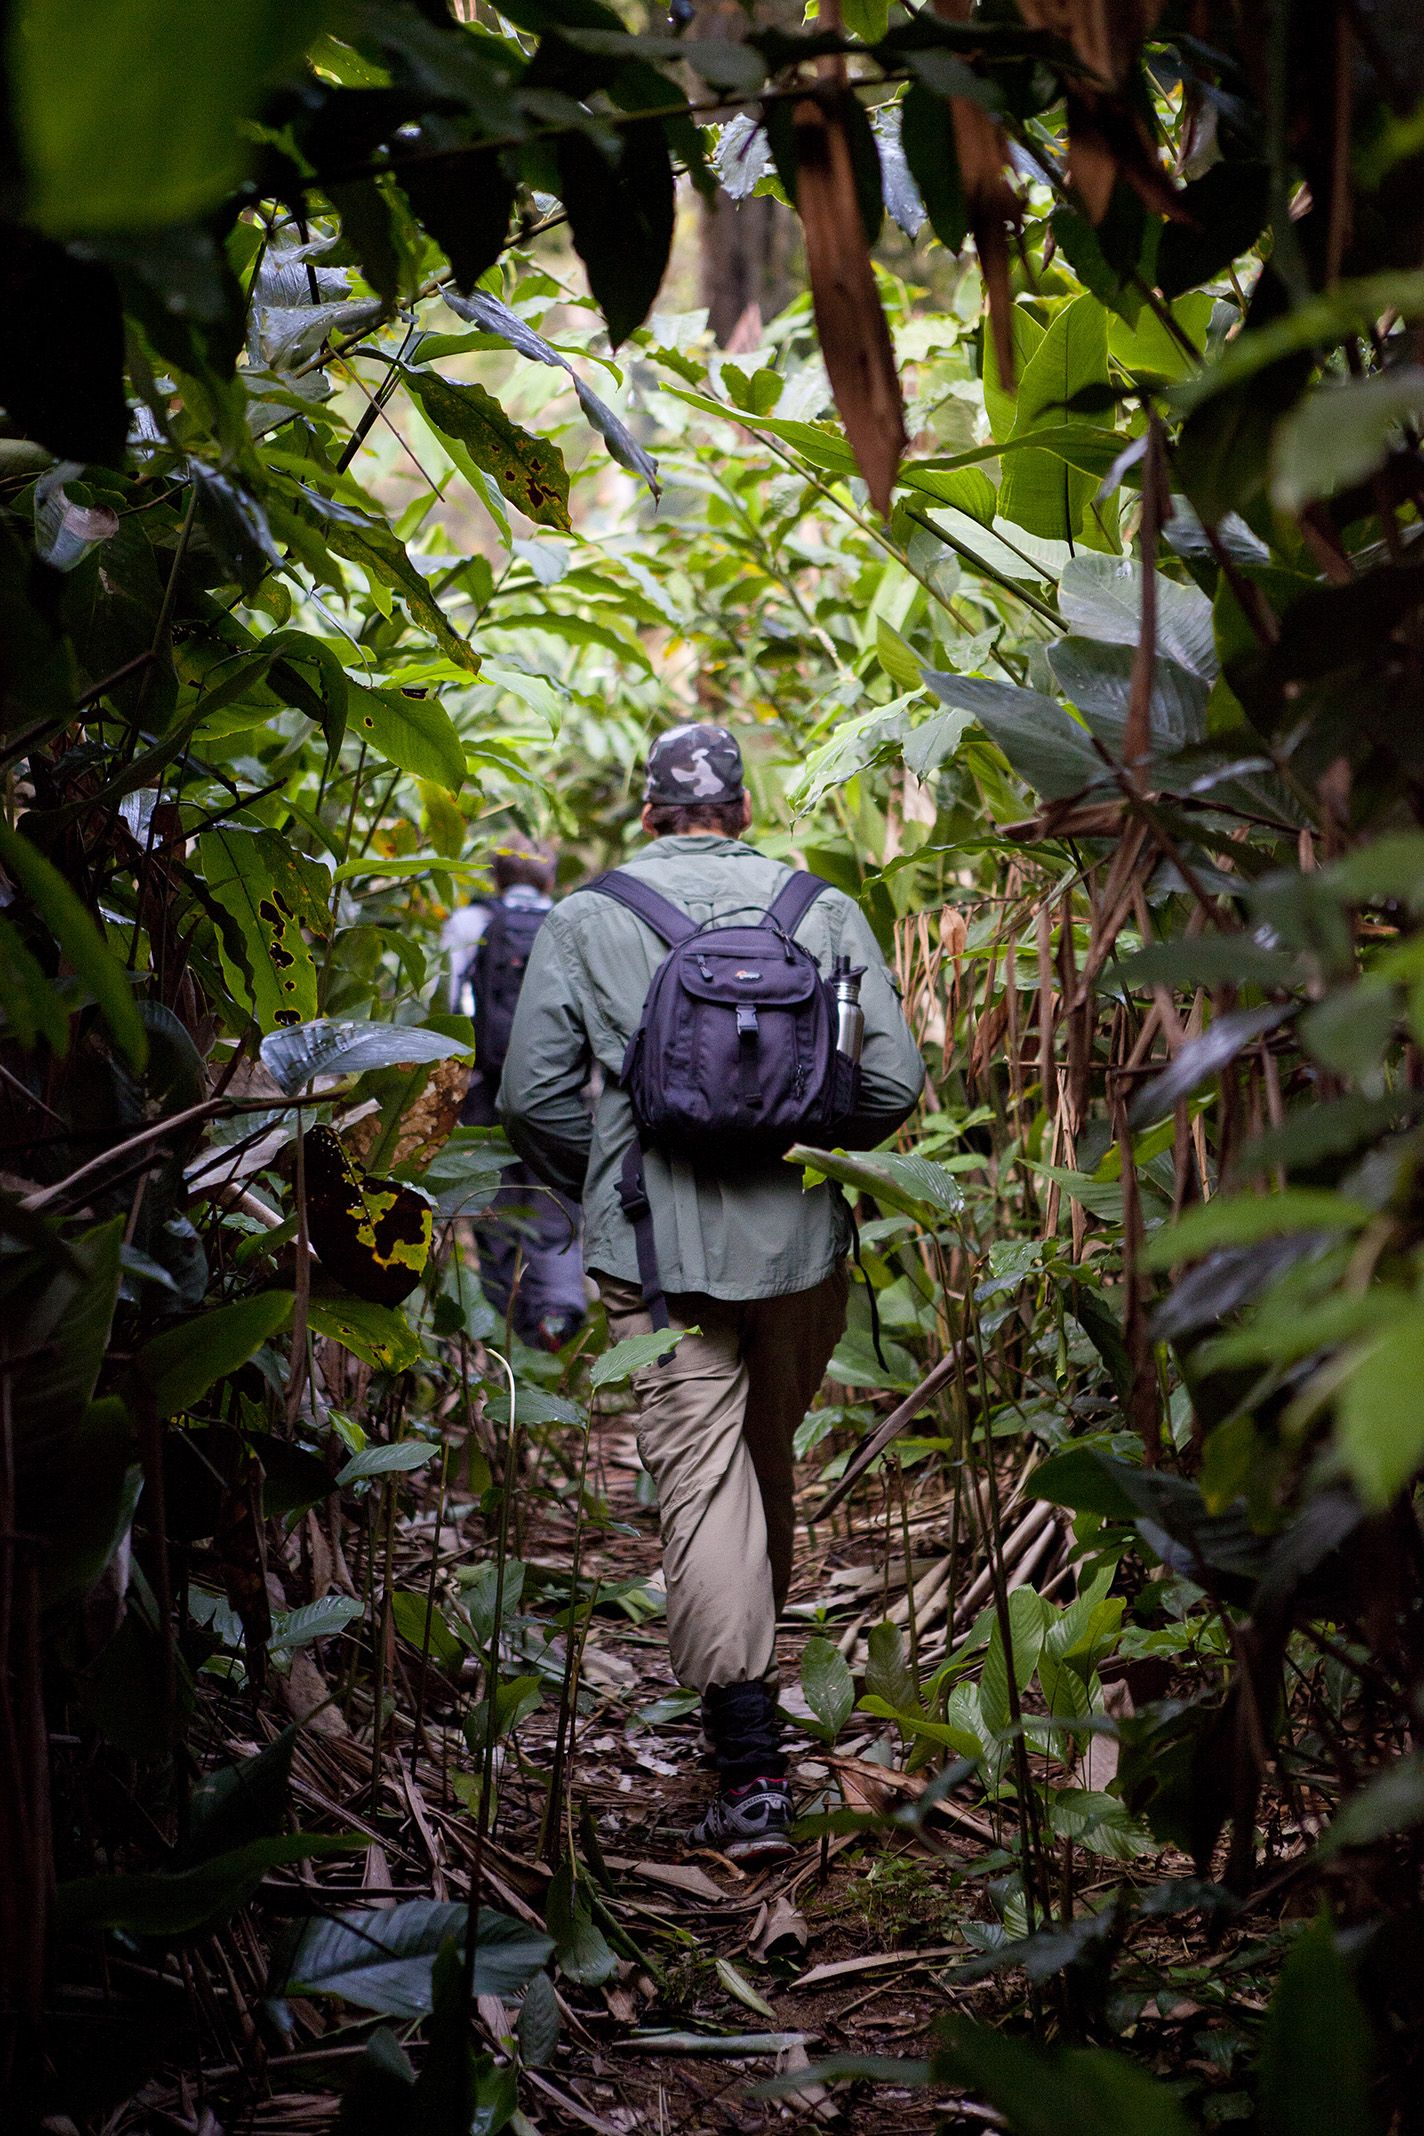 Gorilla Trekking 101 Go2africa Com Gorilla Trekking Trekking Where Is Africa